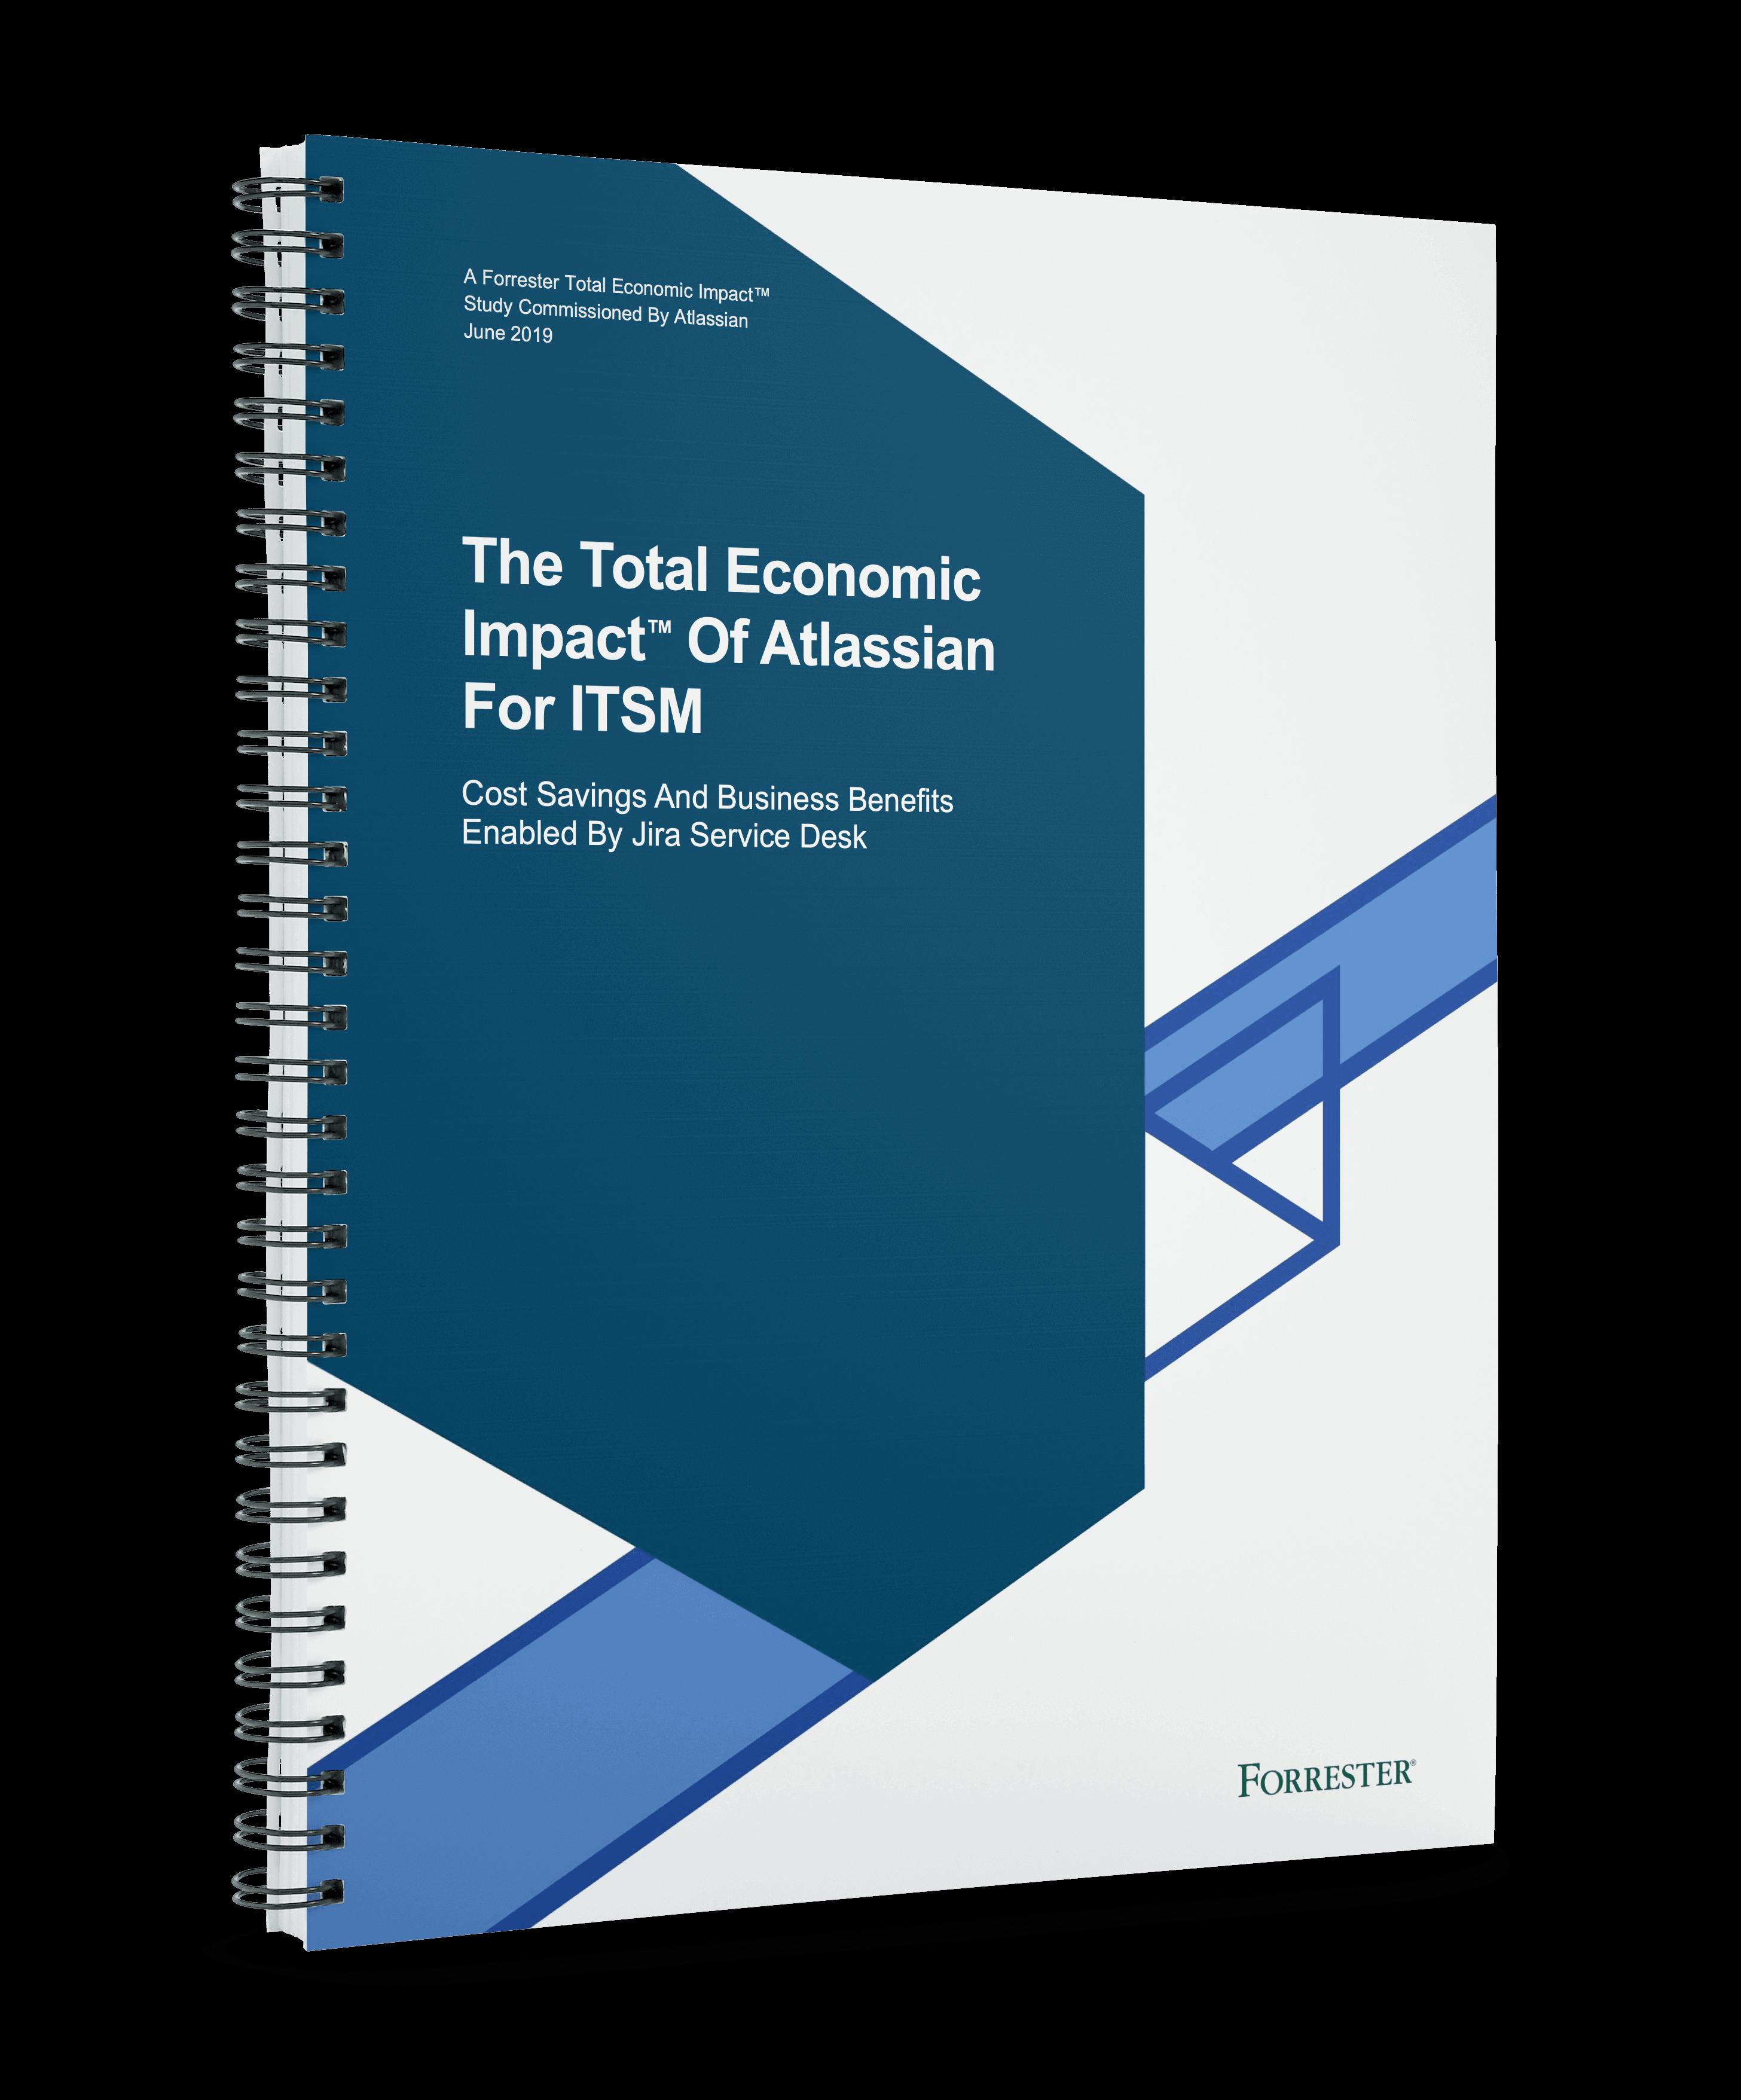 Forrester 计算的 Atlassian for ITSM 的 Total Economic Impact™